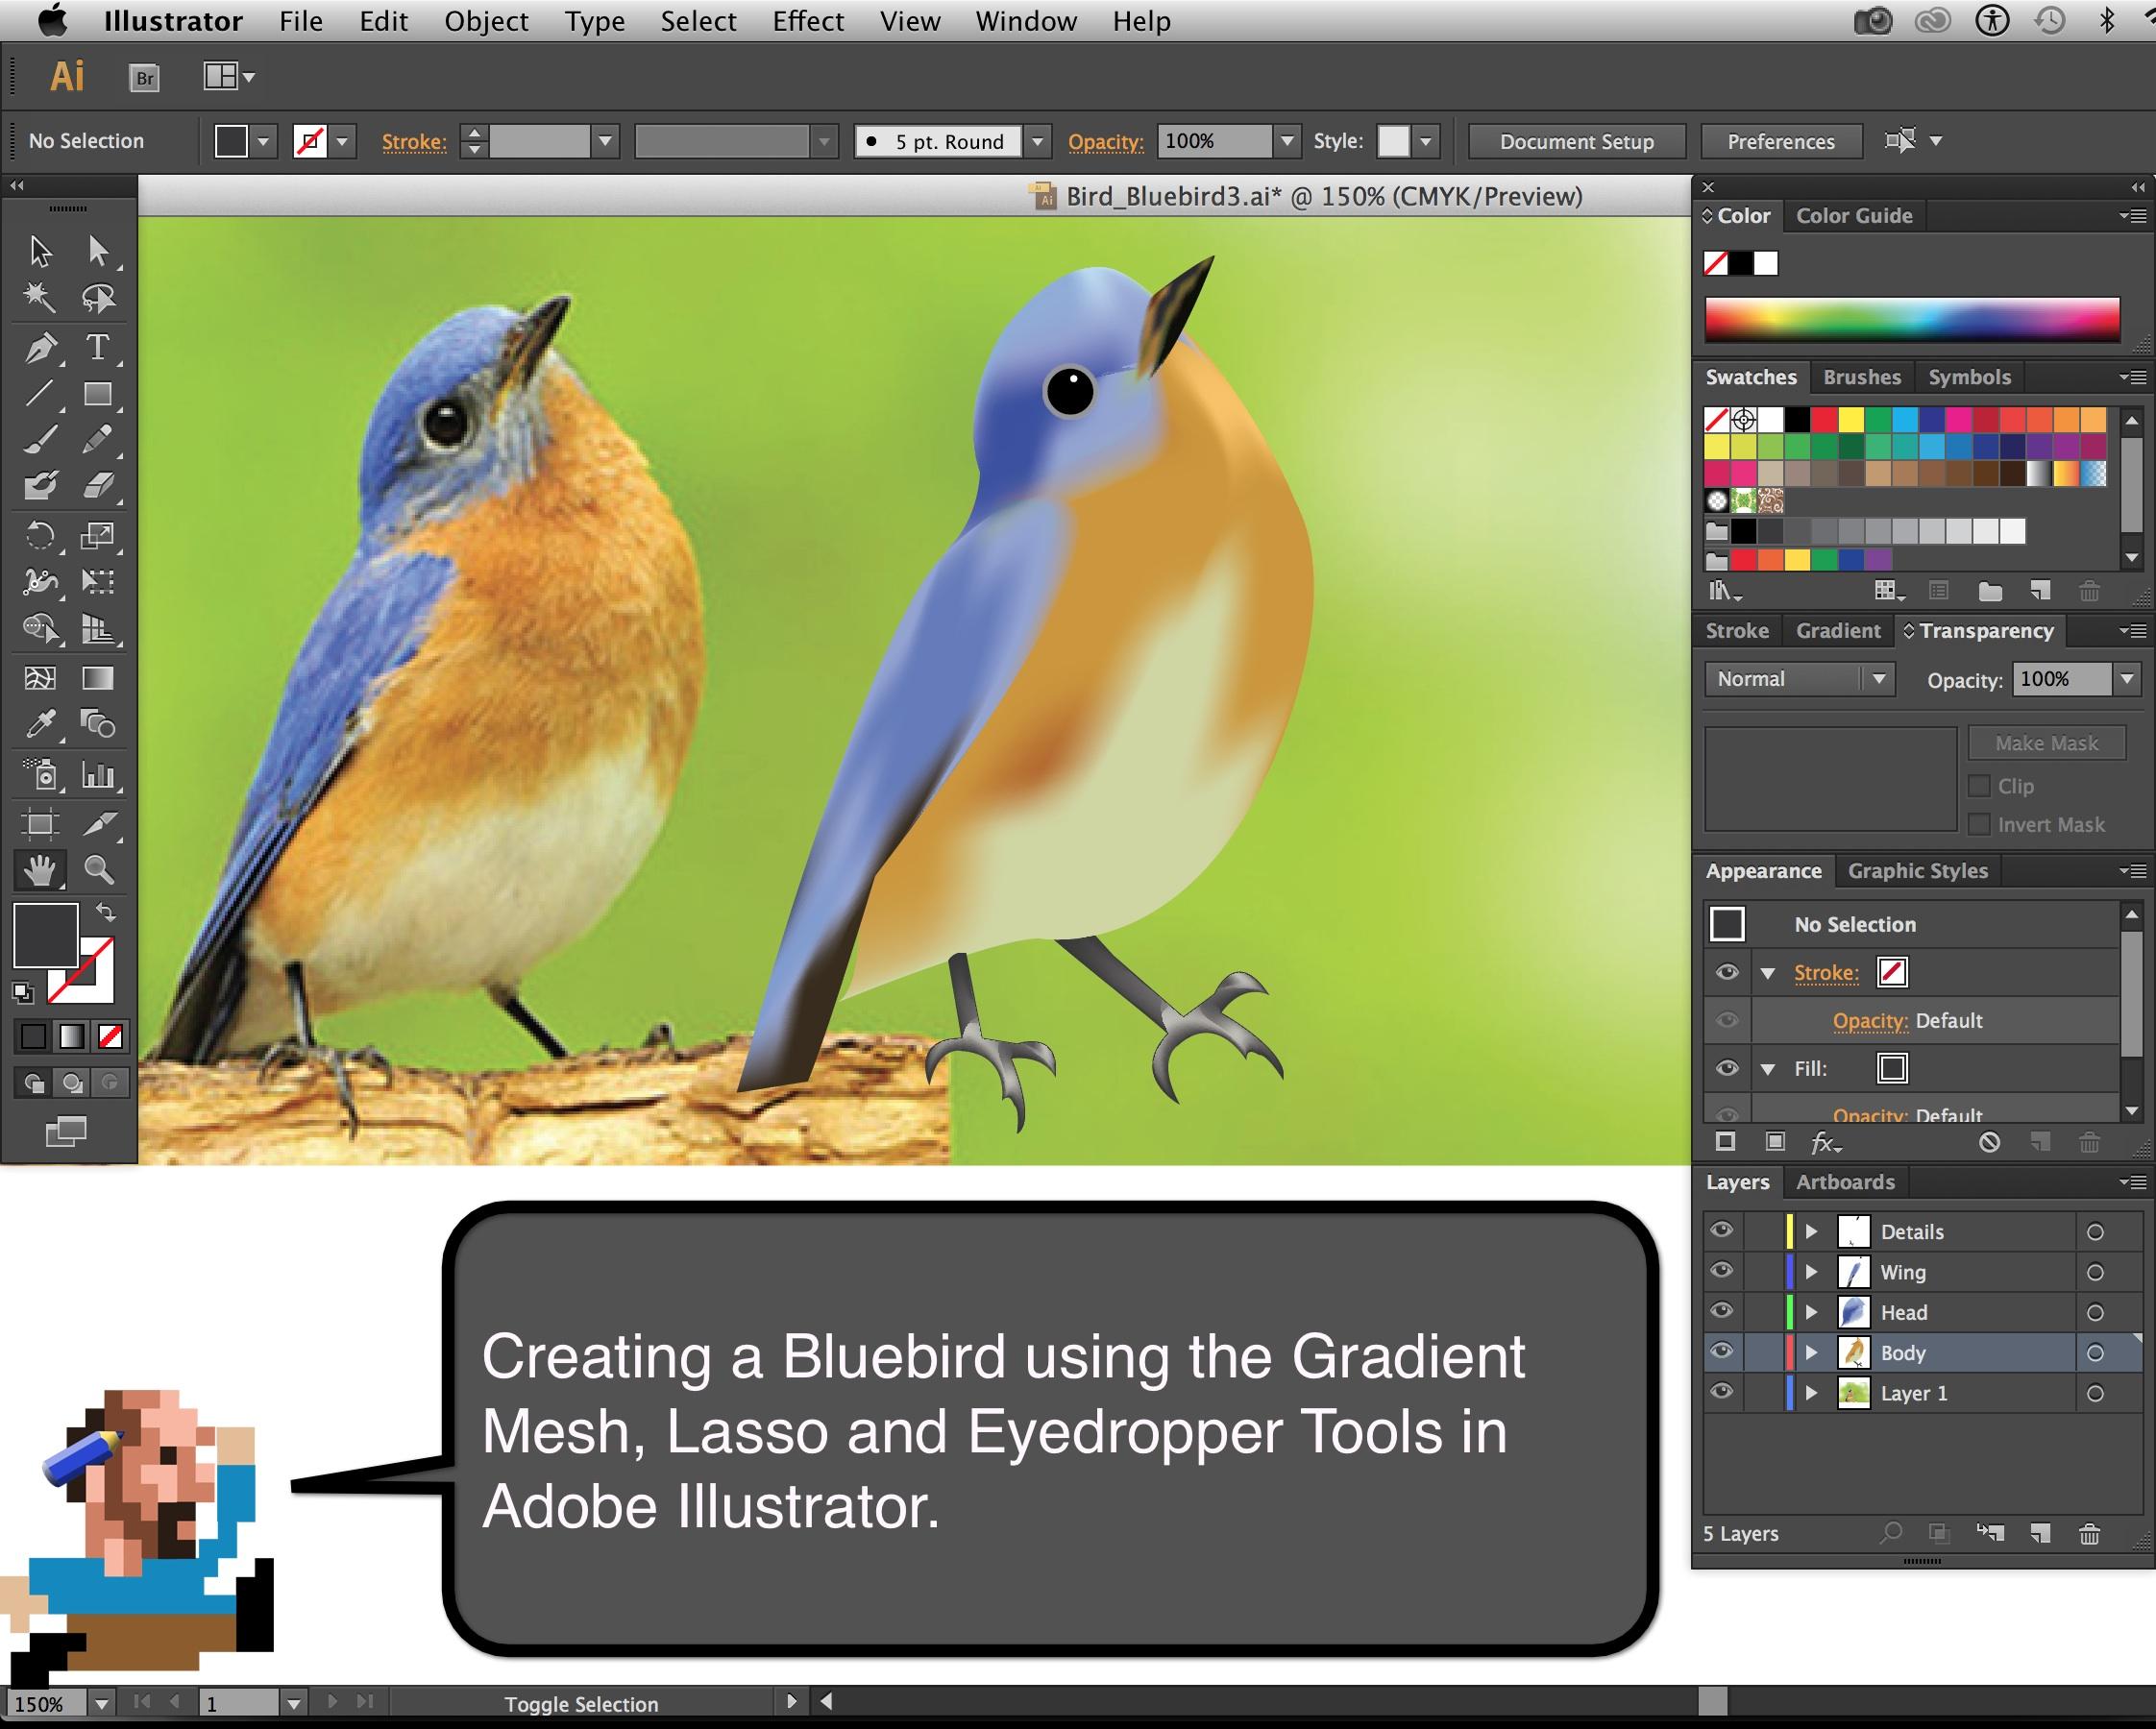 Bluebird_Aim